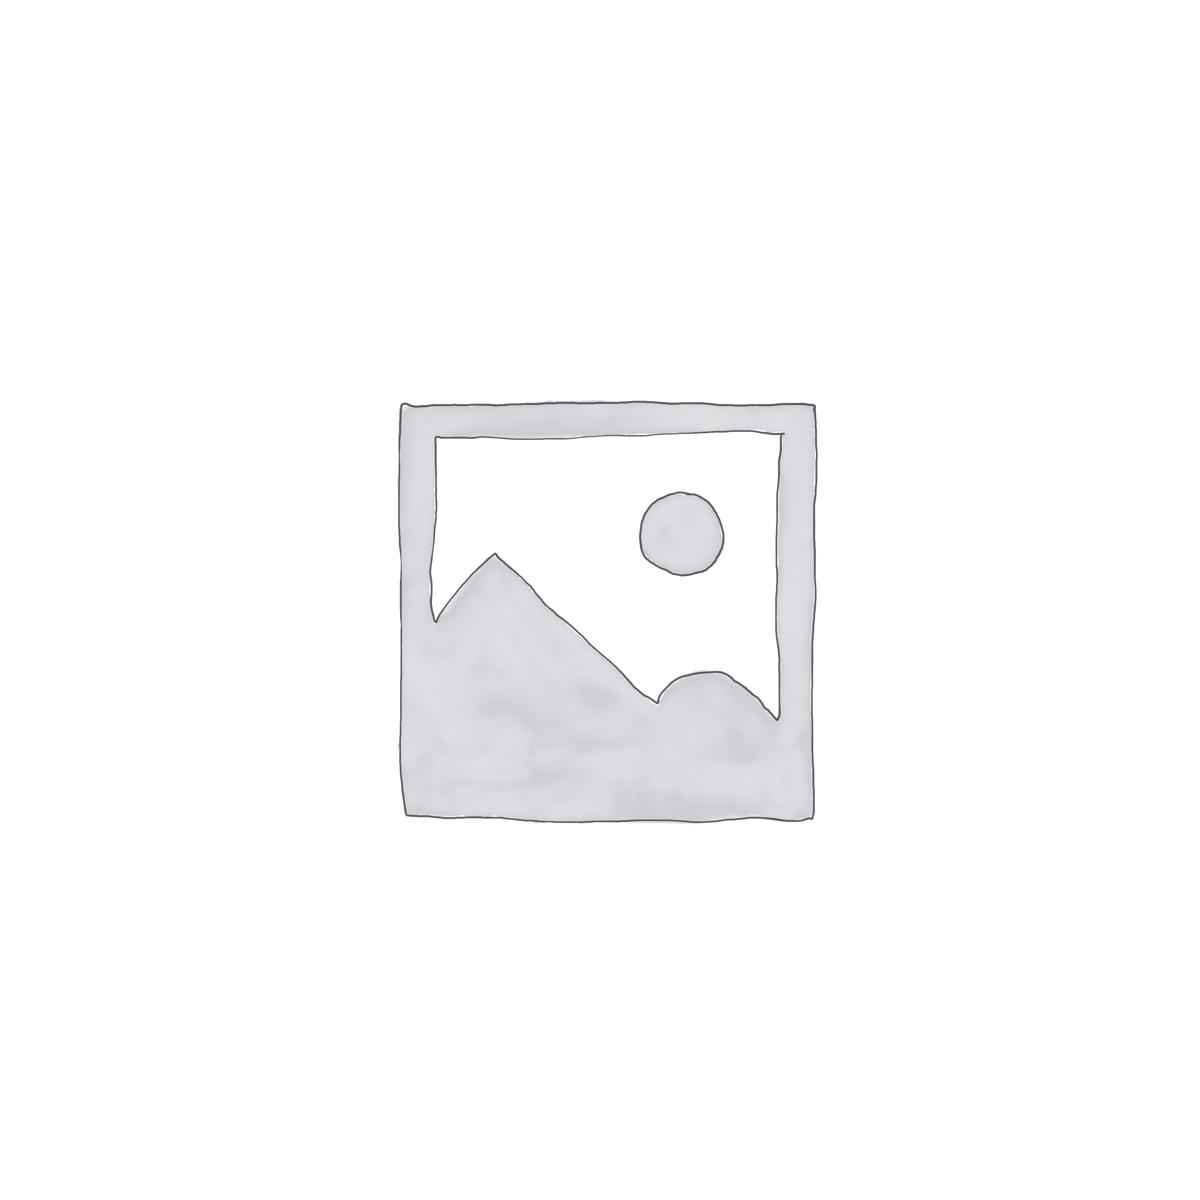 Little Herbs and Flowers on Dark Background Wallpaper Mural